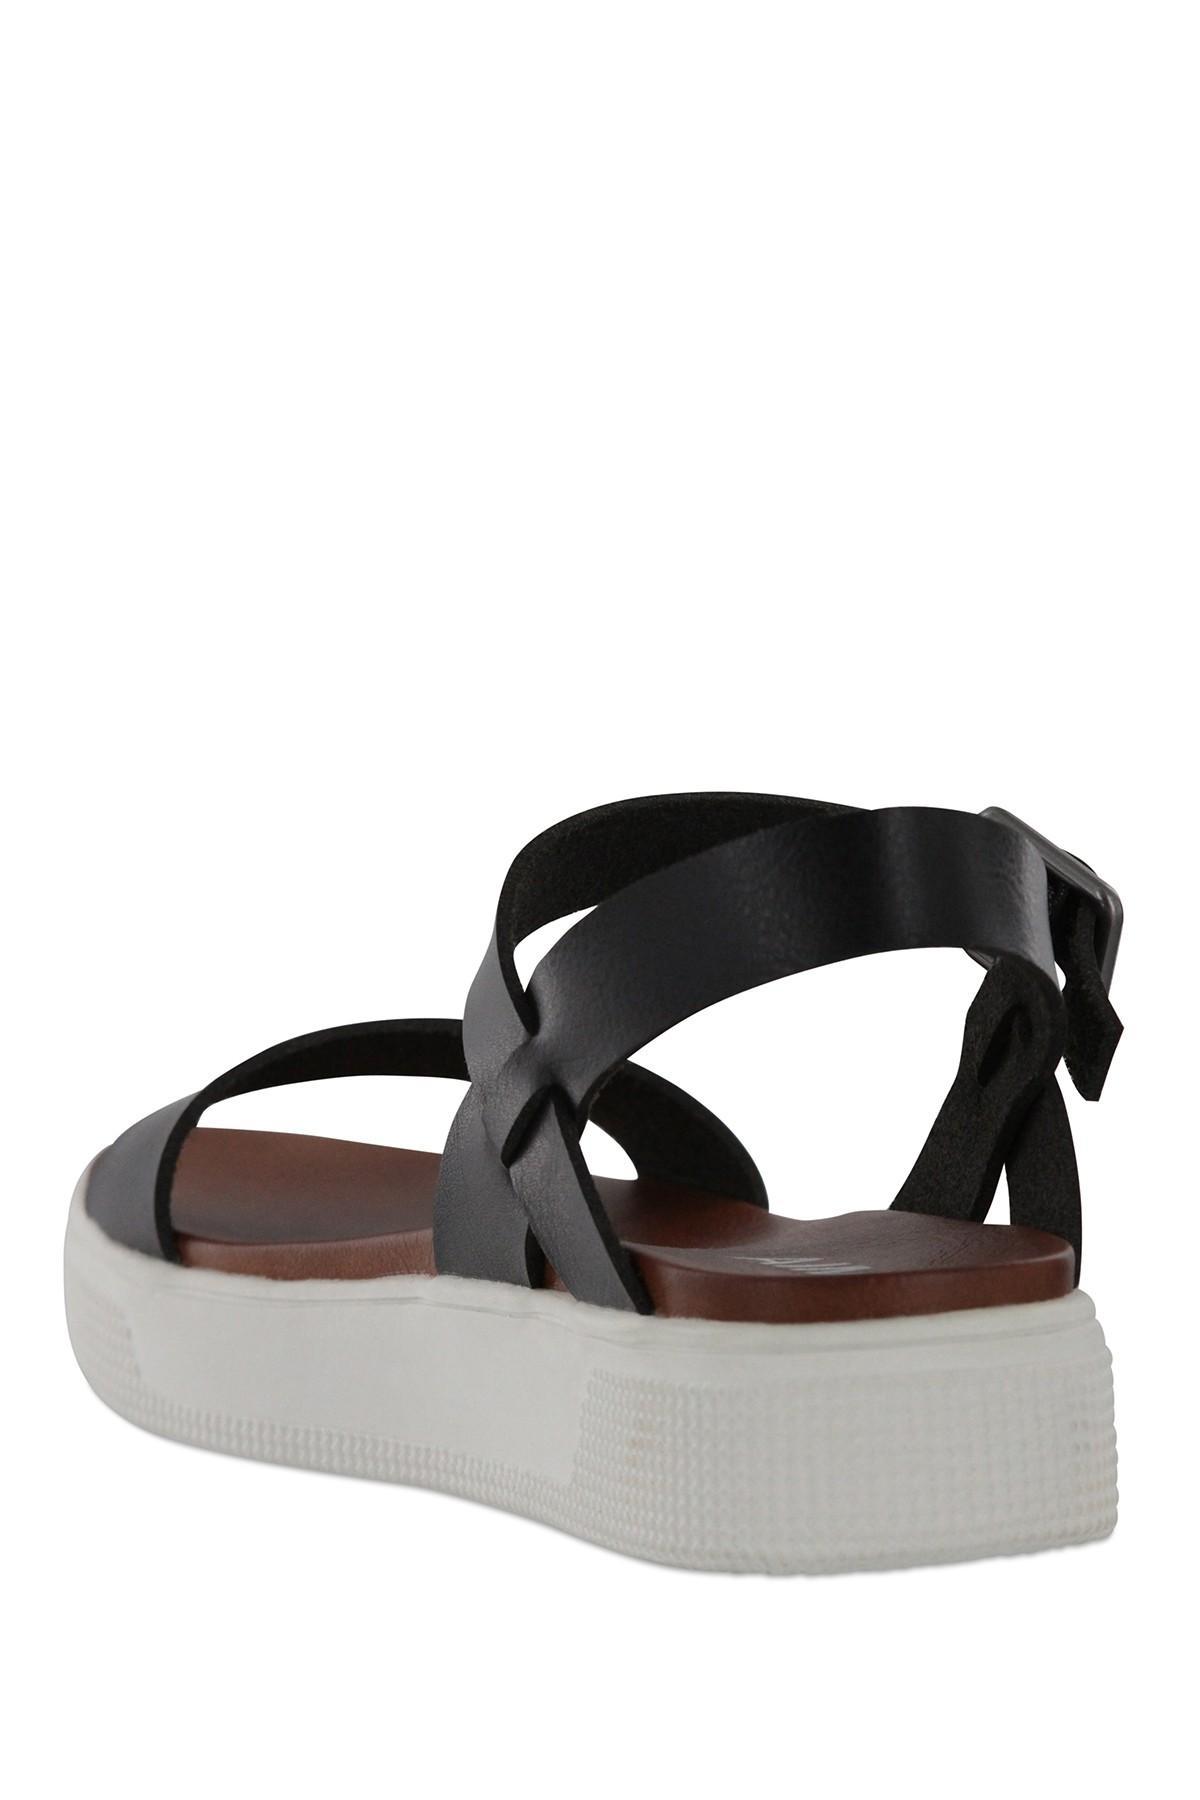 929a2b3cfd2 Lyst - MIA Abby Open Toe Platform Sandal in Black